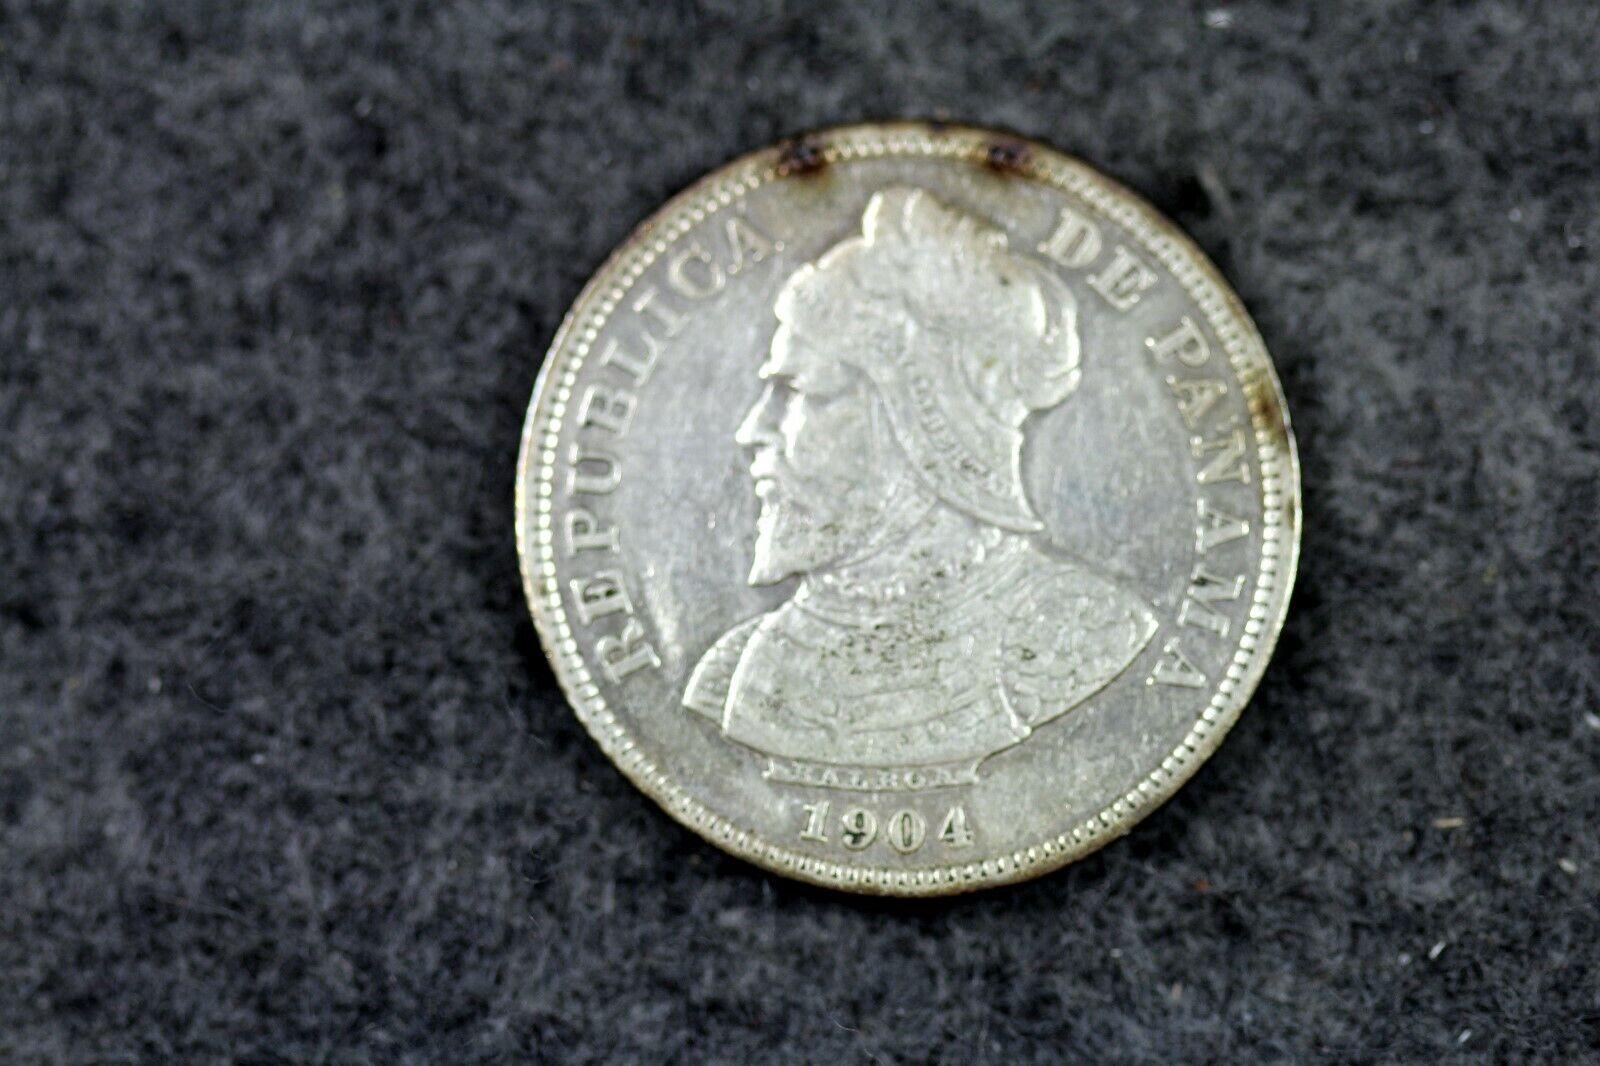 1904 - Panama Silver 25 Centesimos Coin J03178 - $20.00